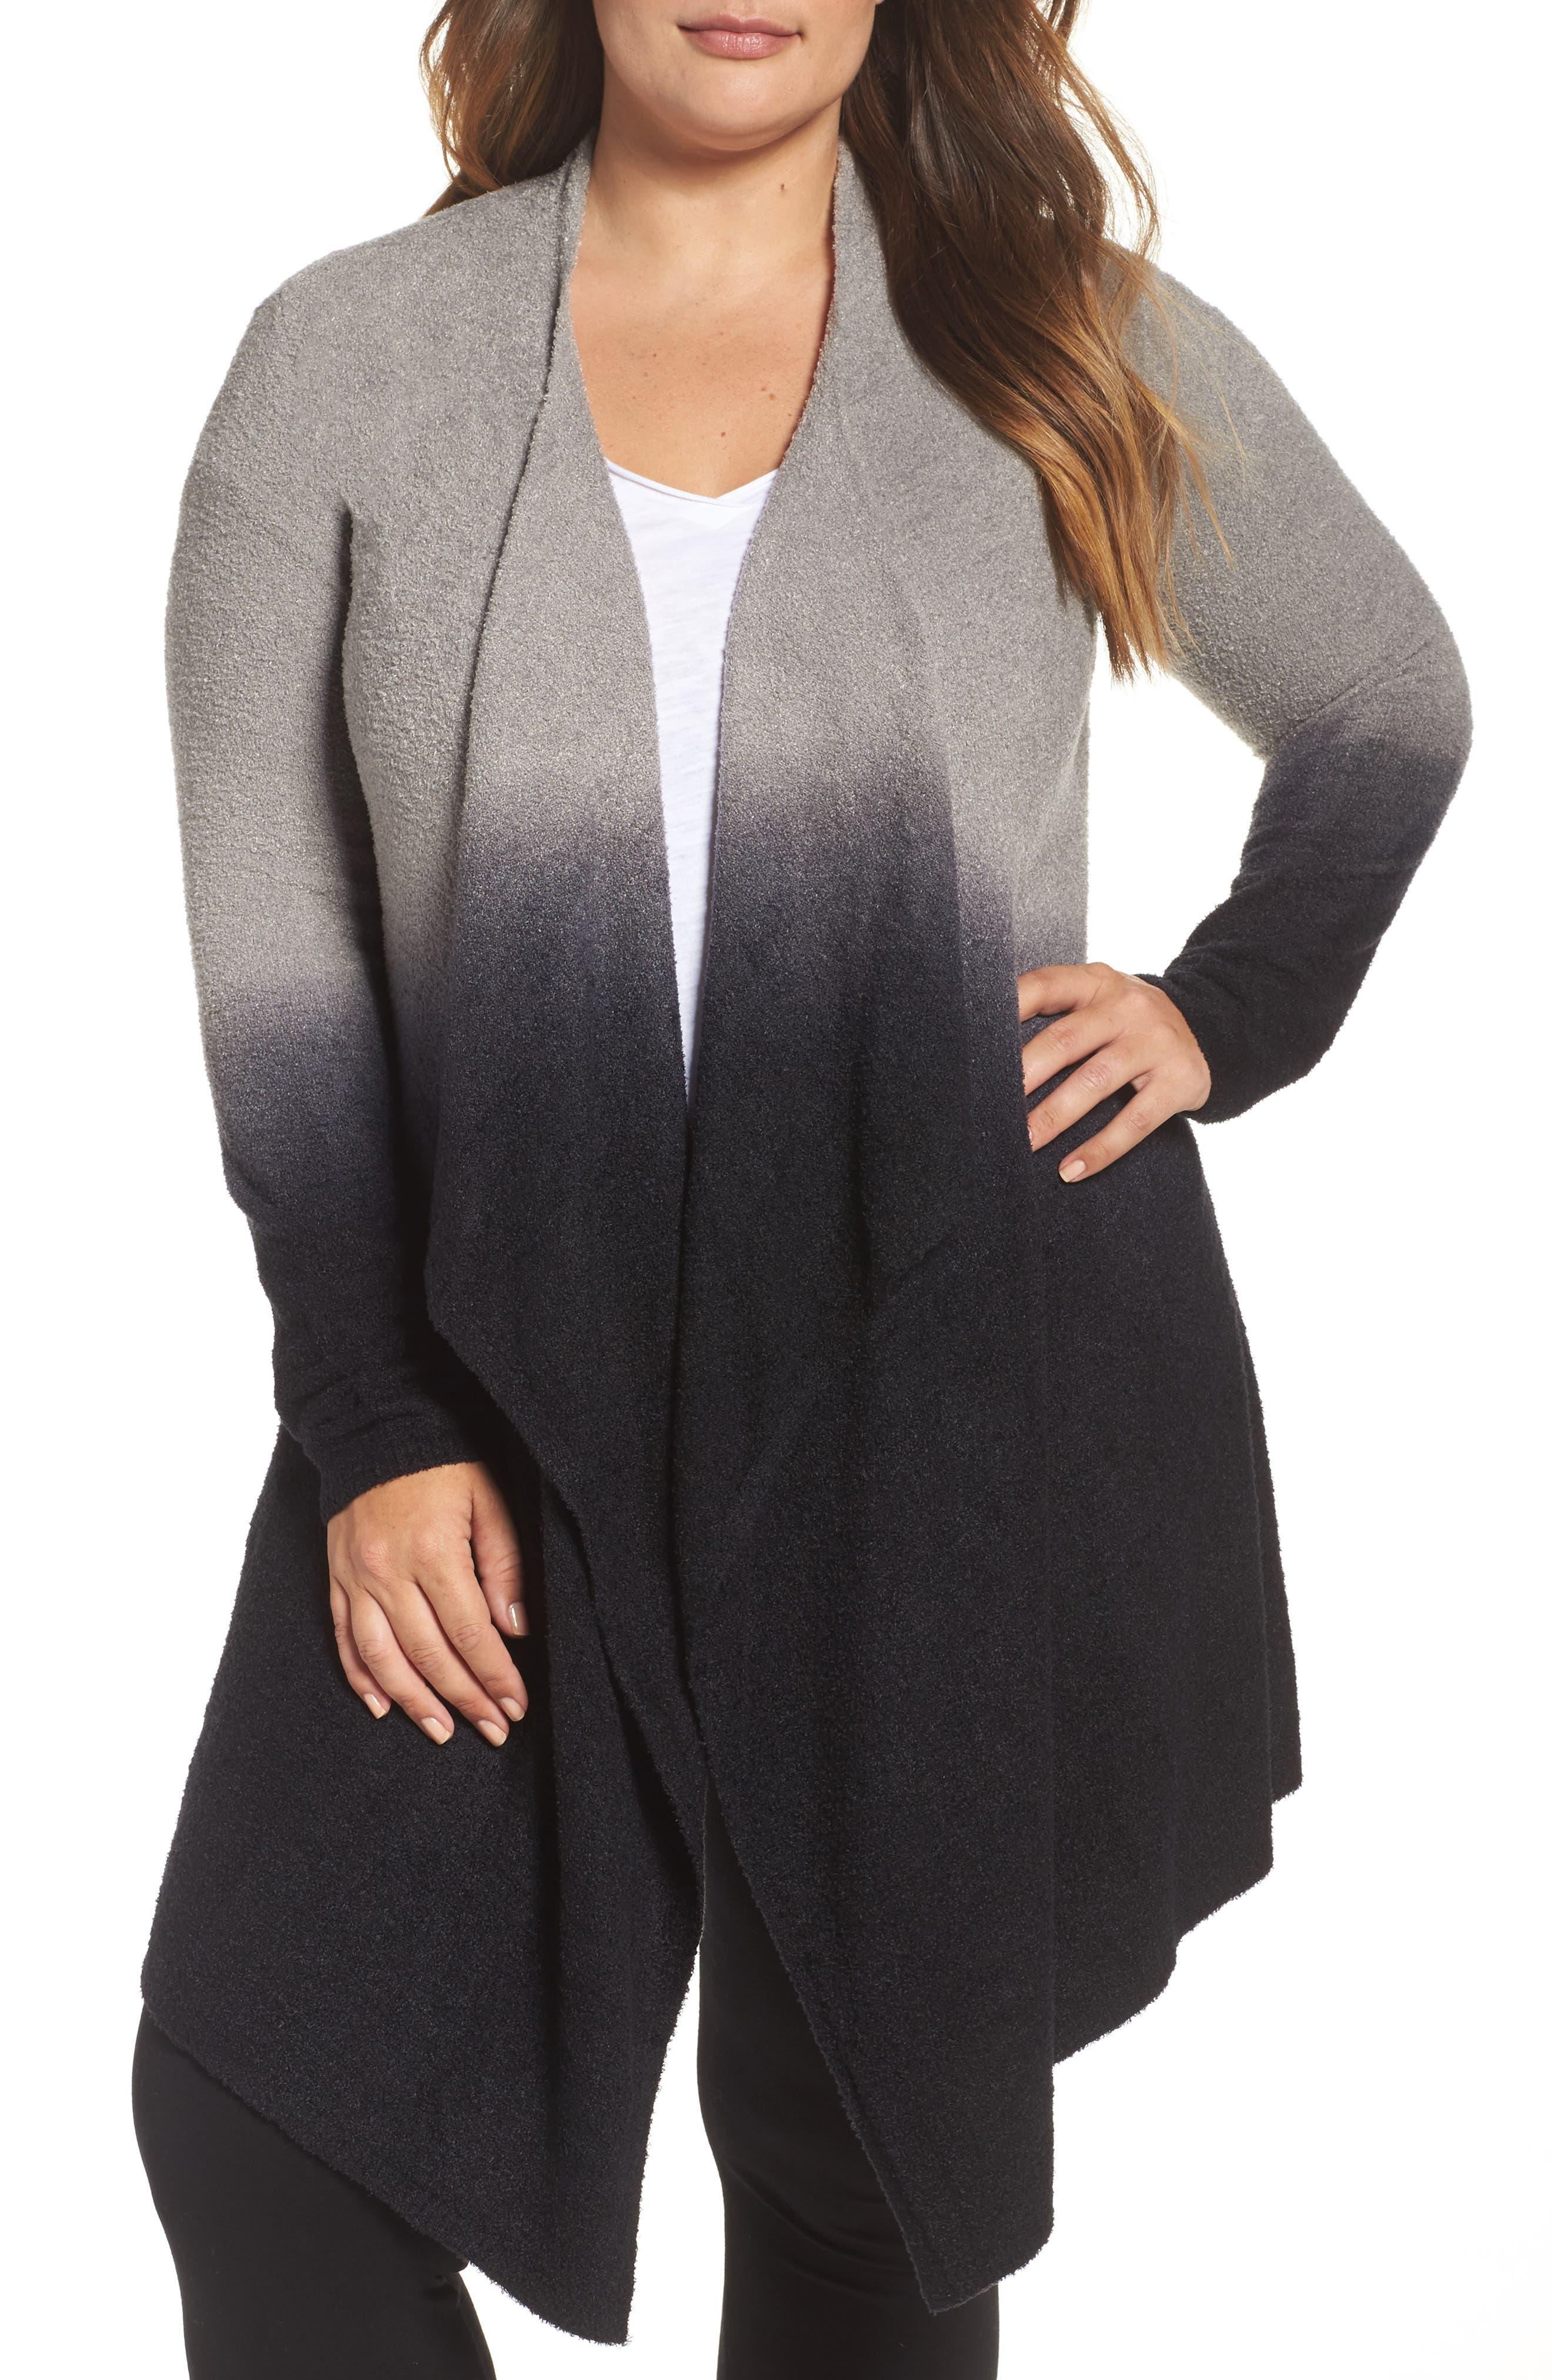 Main Image - Barefoot Dreams® CozyChic Lite® Calypso Wrap Cardigan (Plus Size) (Nordstrom Exclusive)